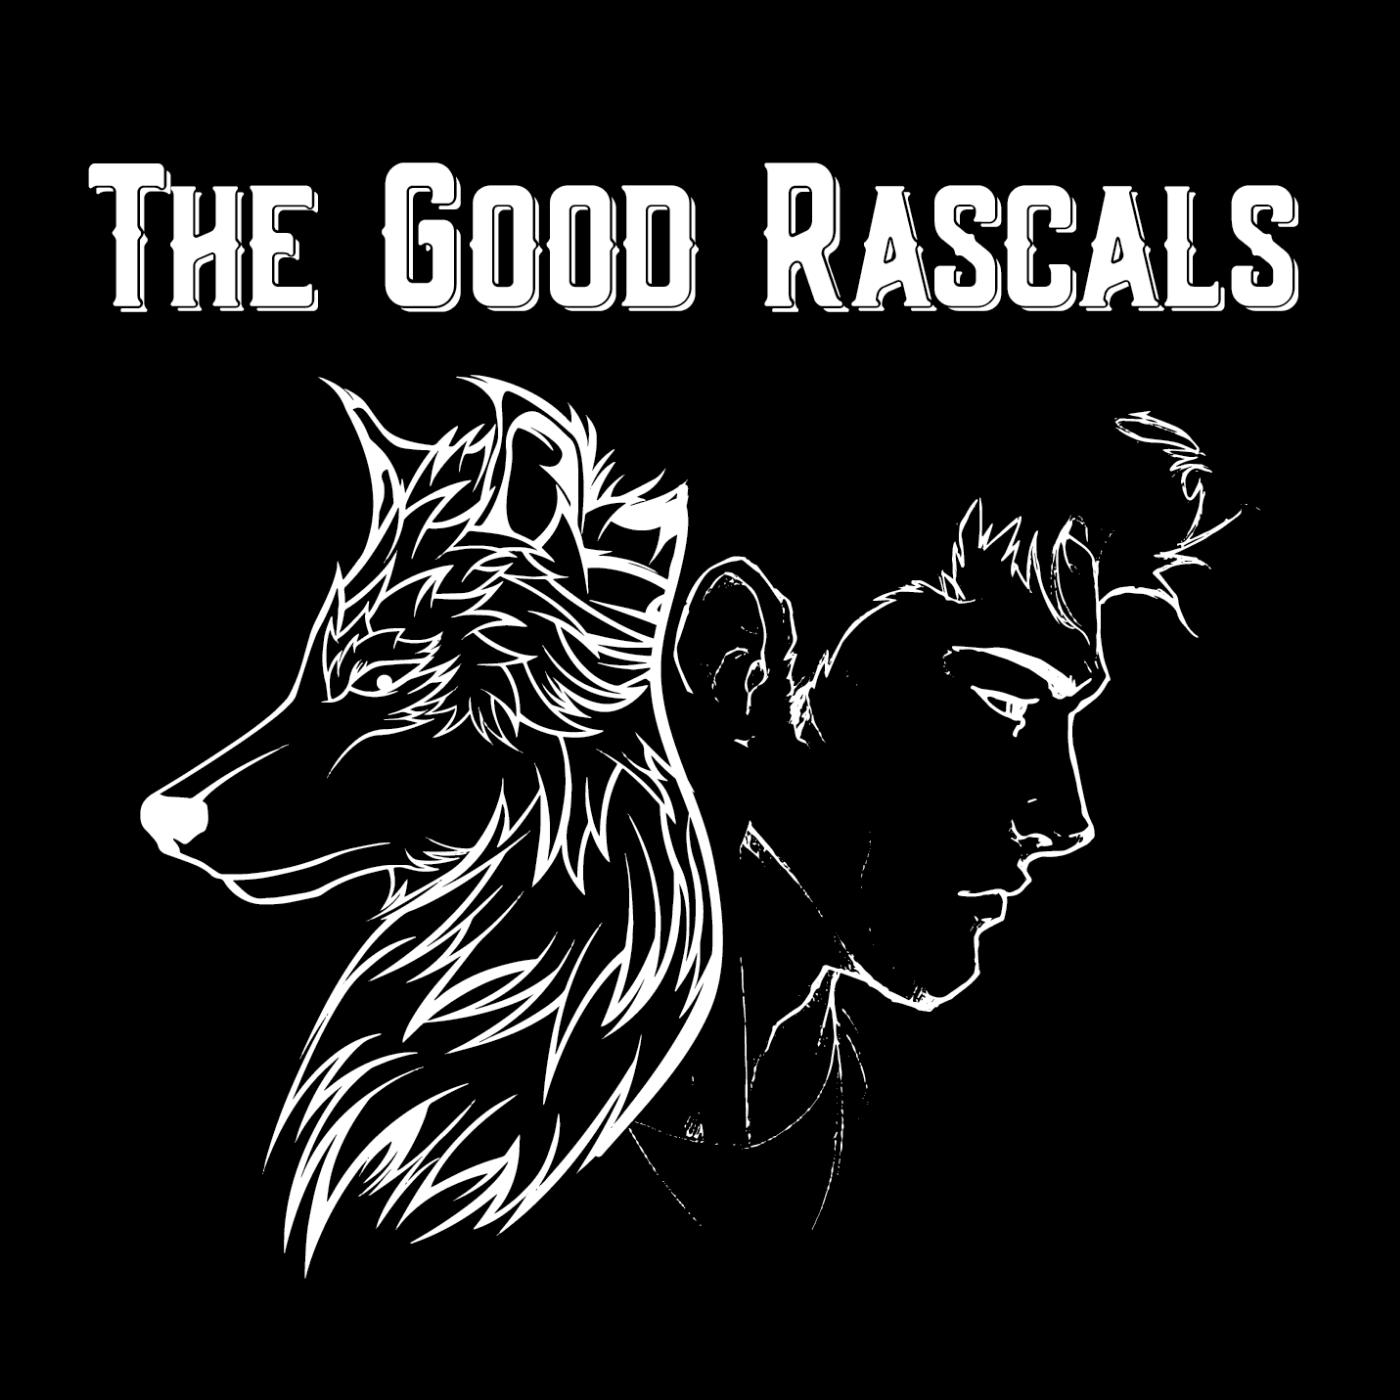 The Good Rascals show art